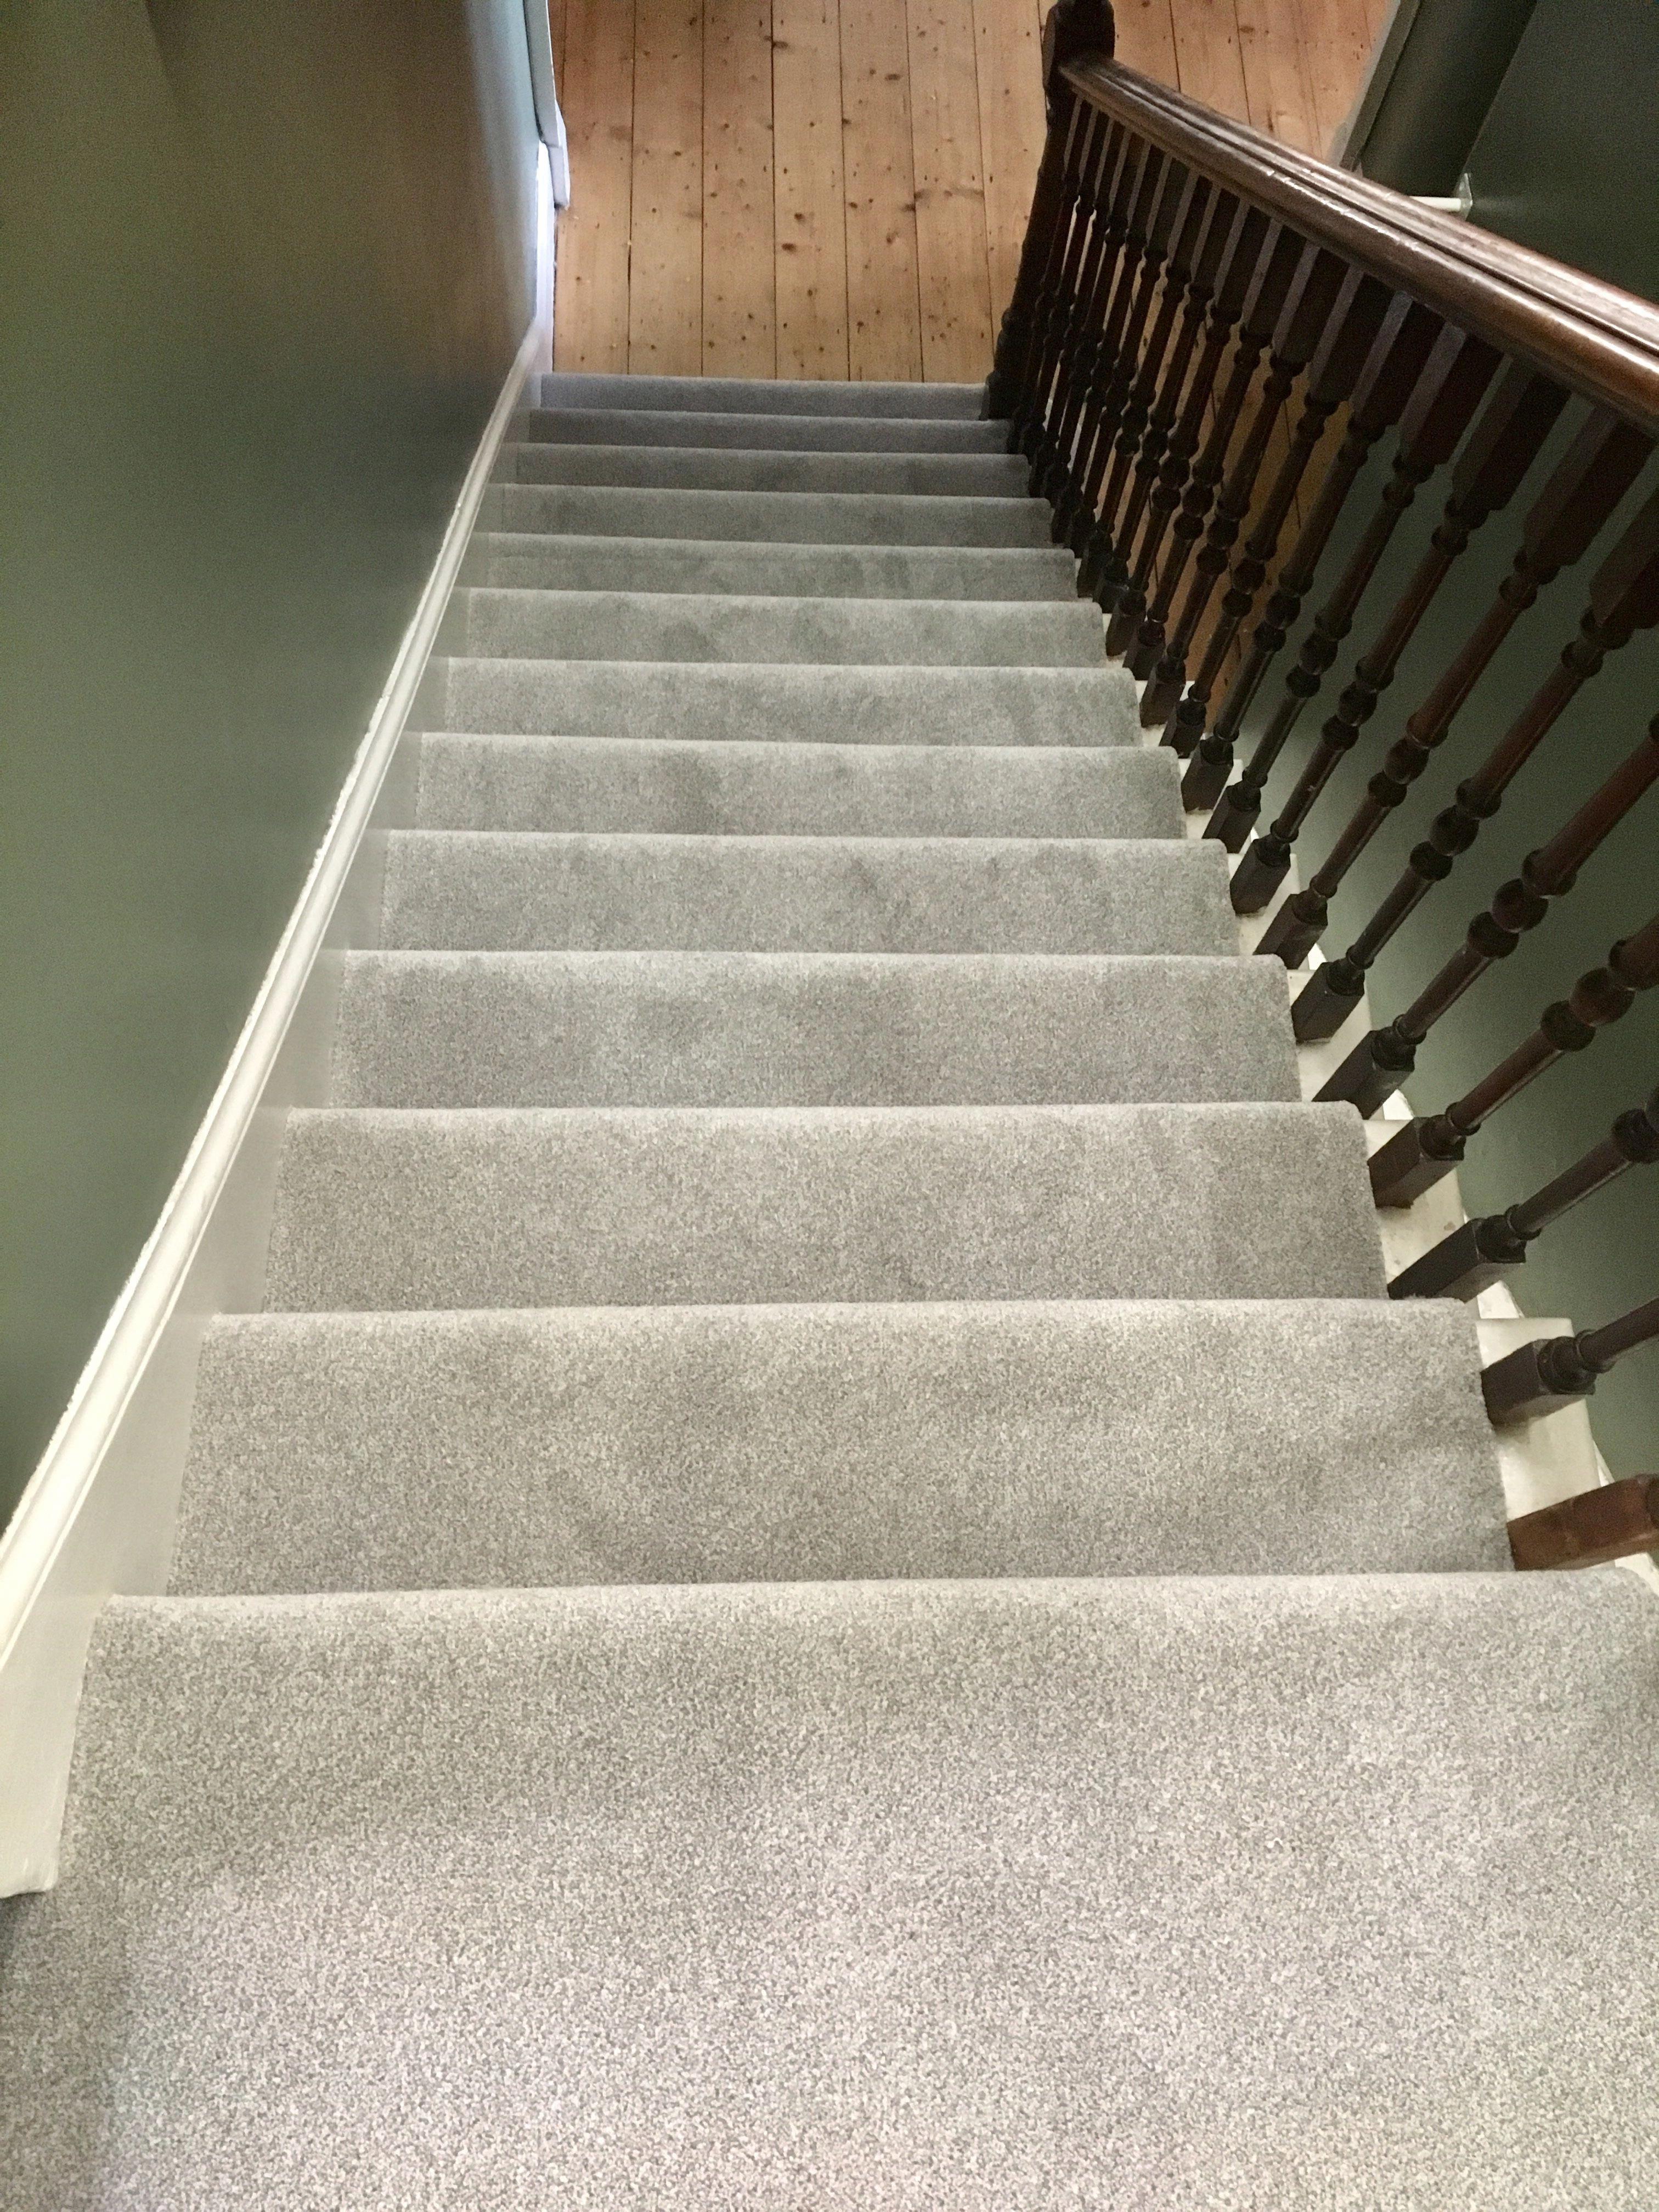 Carpet Runner Installation Near Me Carpet Colors Stairs Stairways